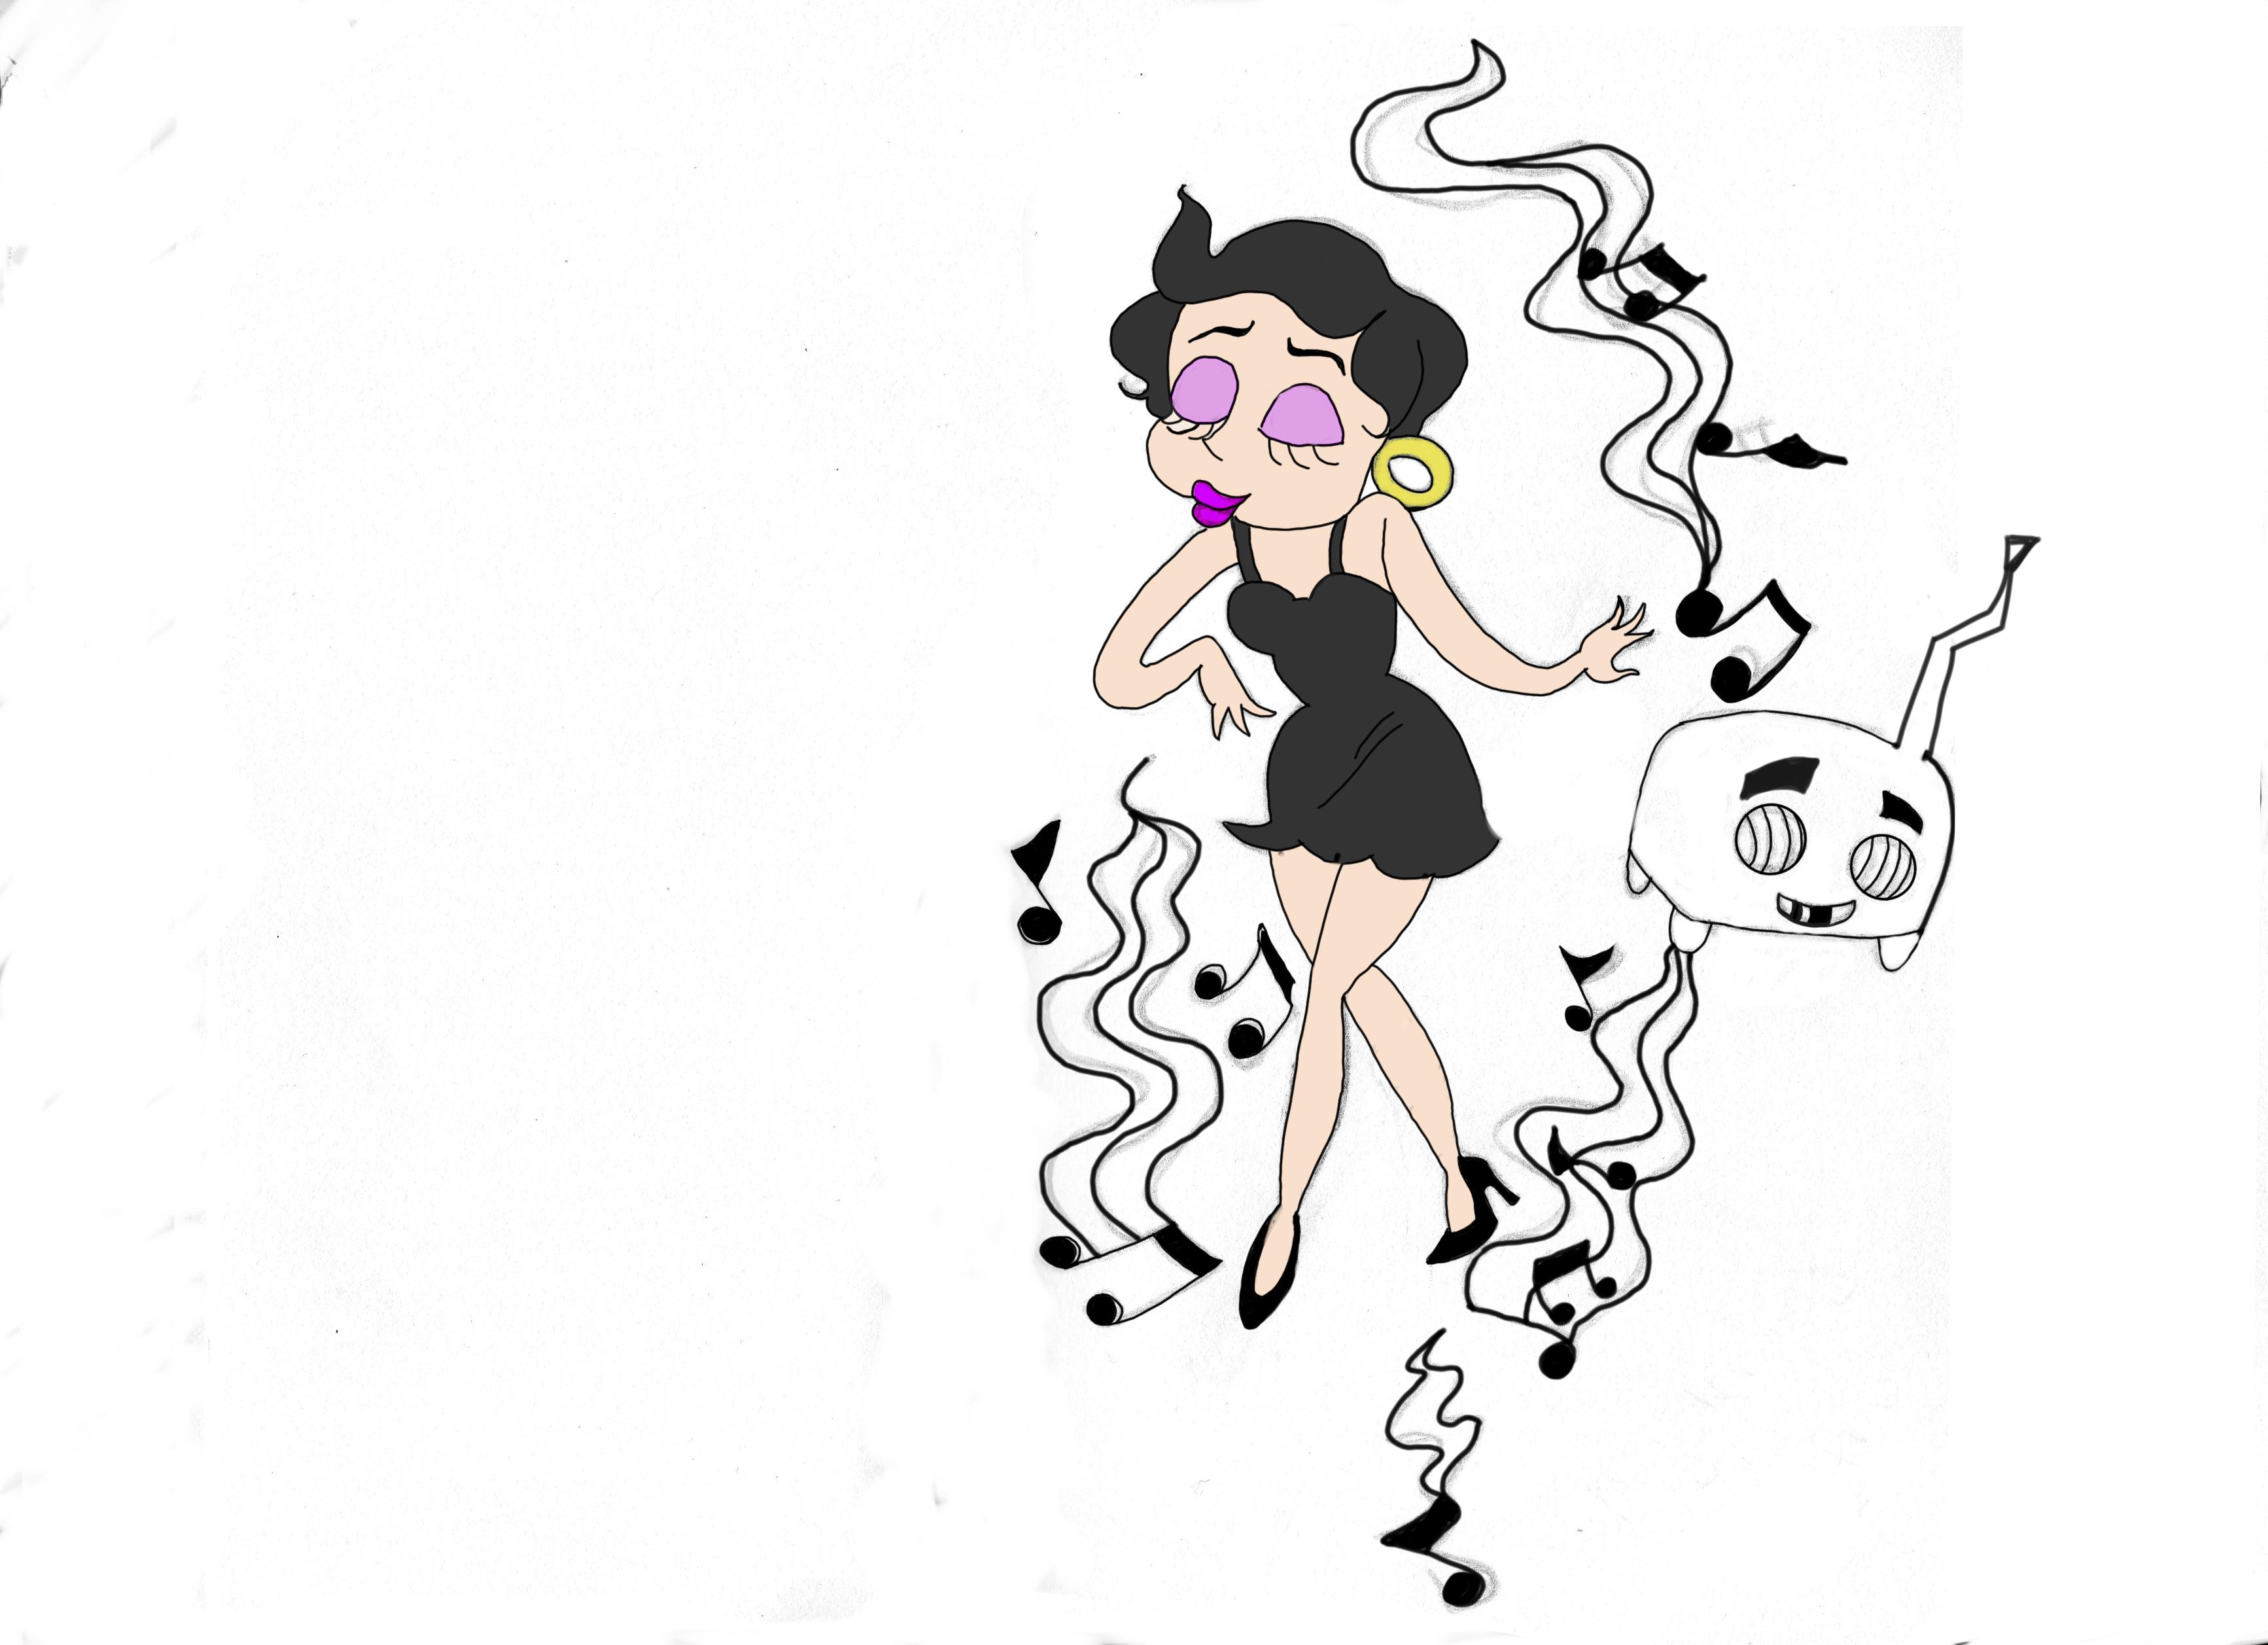 Mysterious Rhythm by CharleneBaltimore on DeviantArt